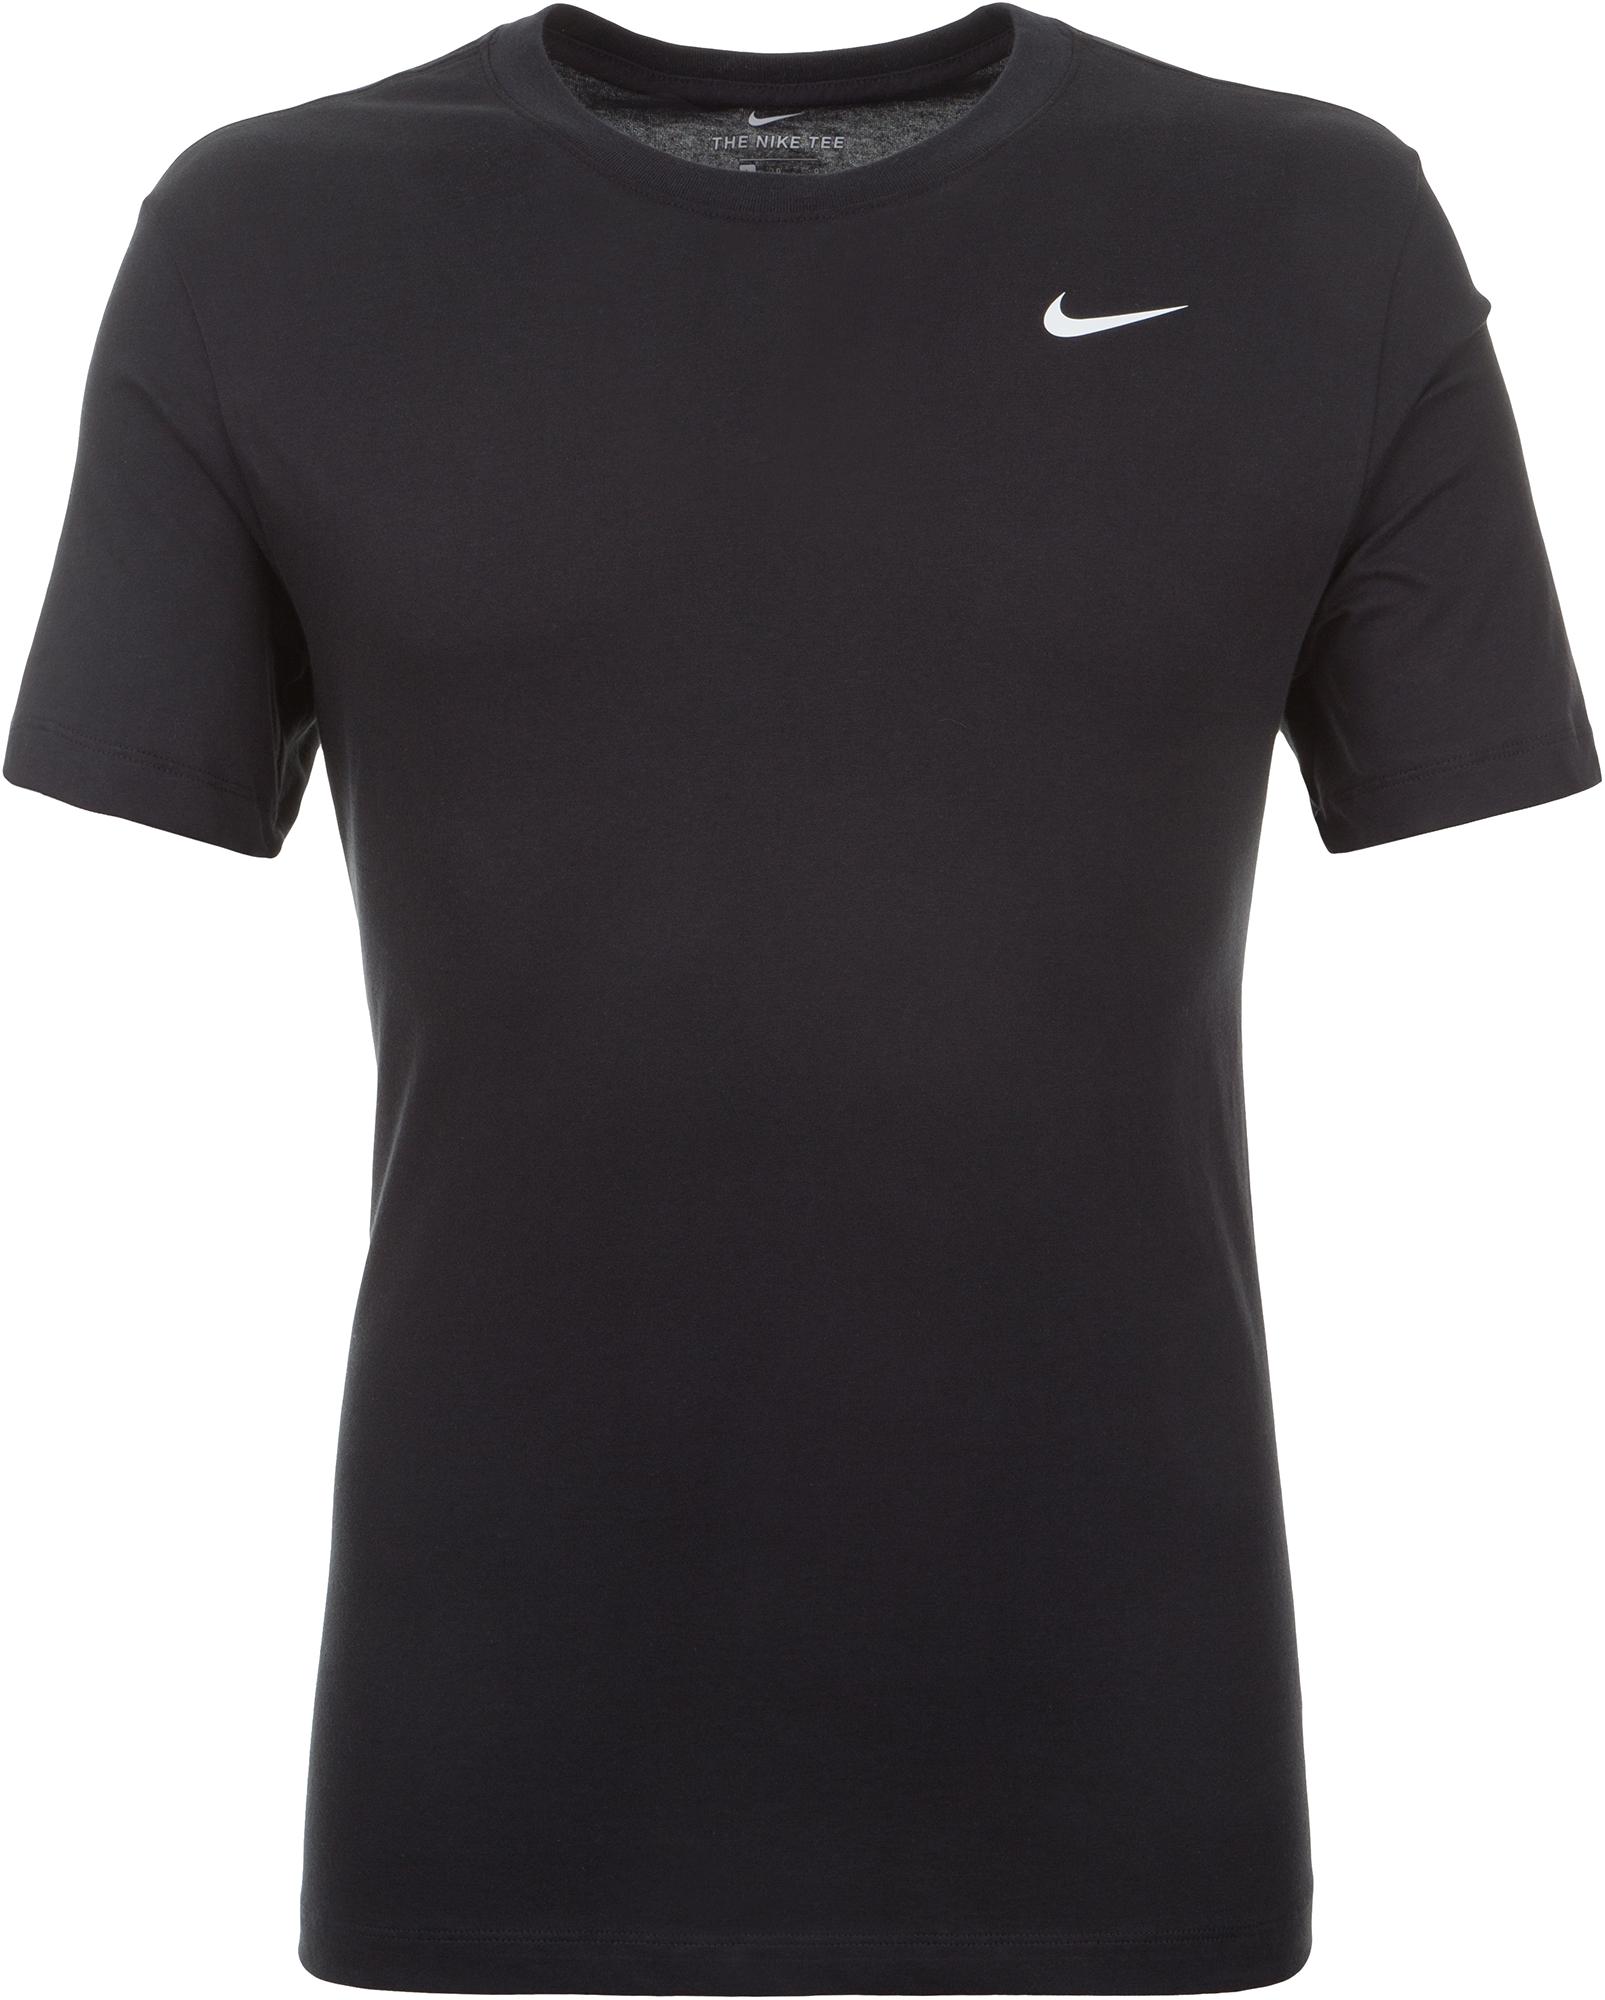 Nike Футболка мужская Nike Dri-FIT, размер 52-54 цена